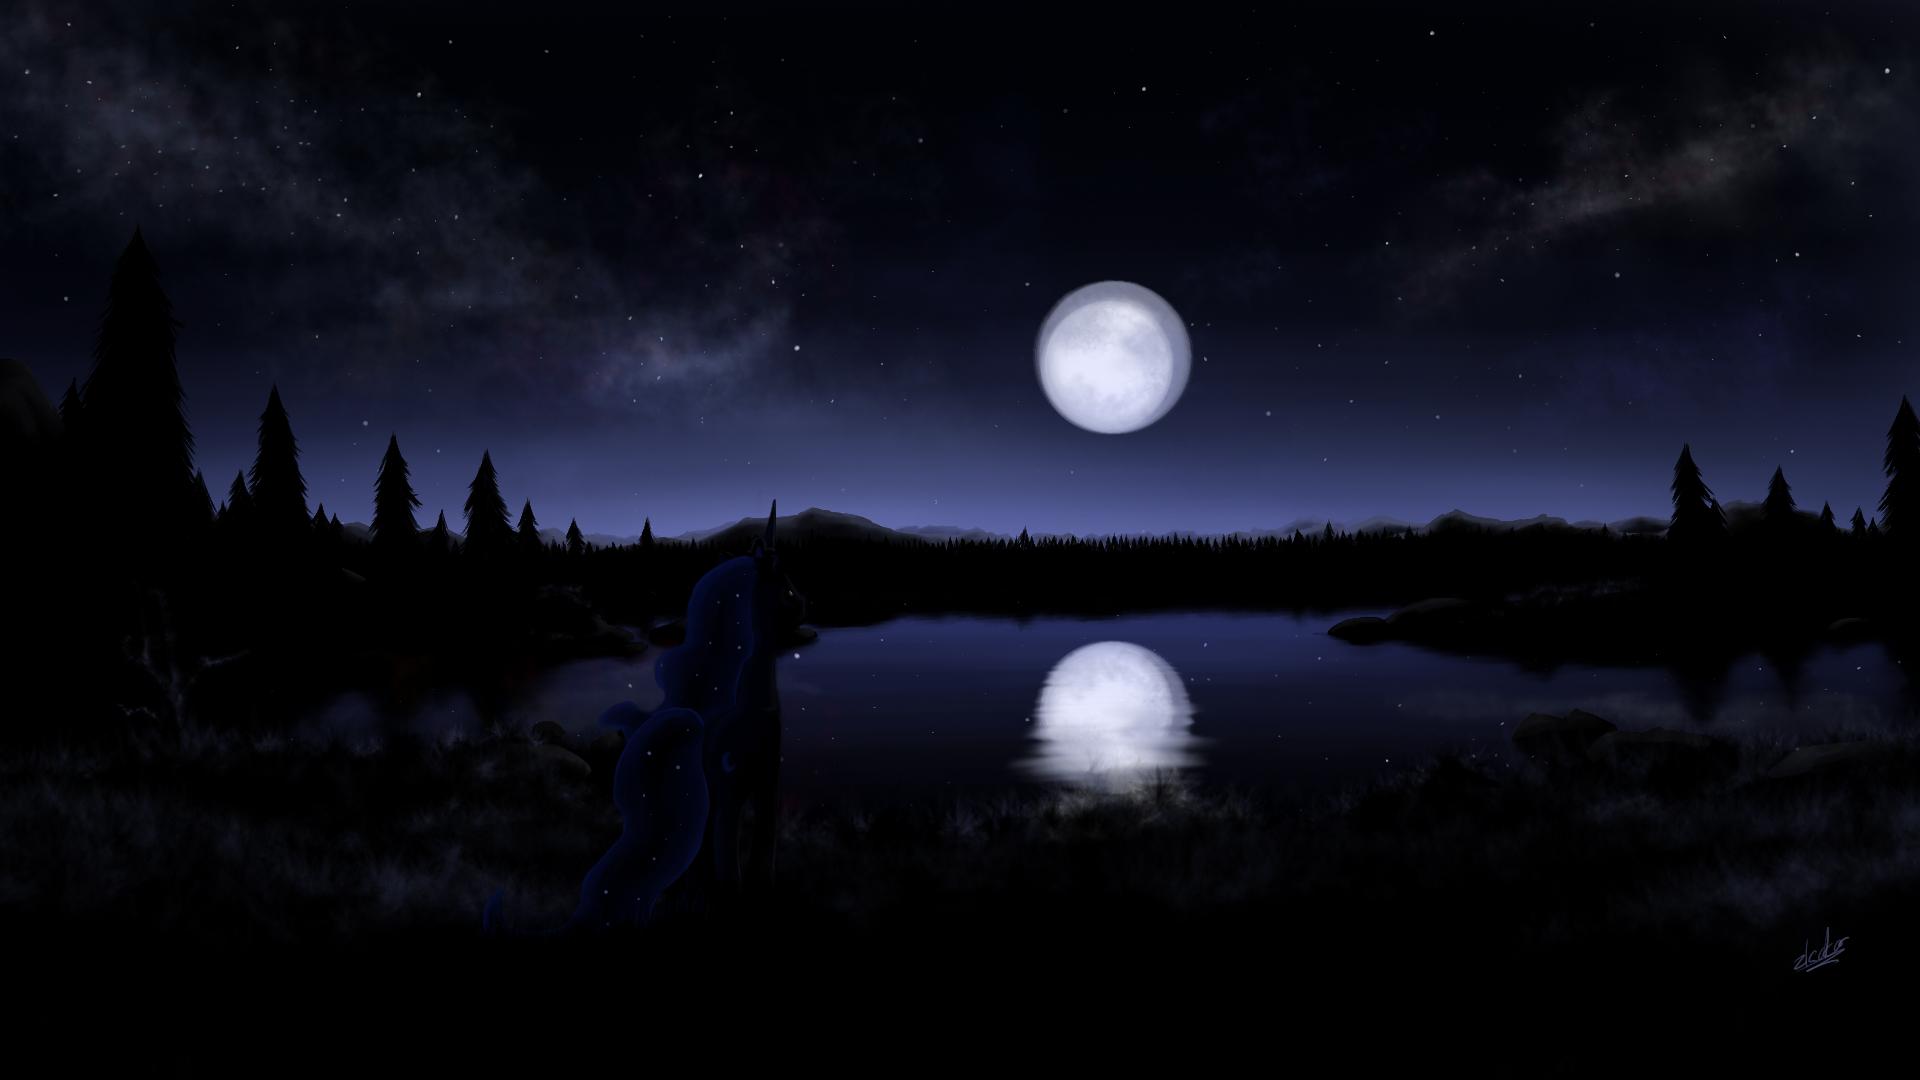 luna night by zlack3r